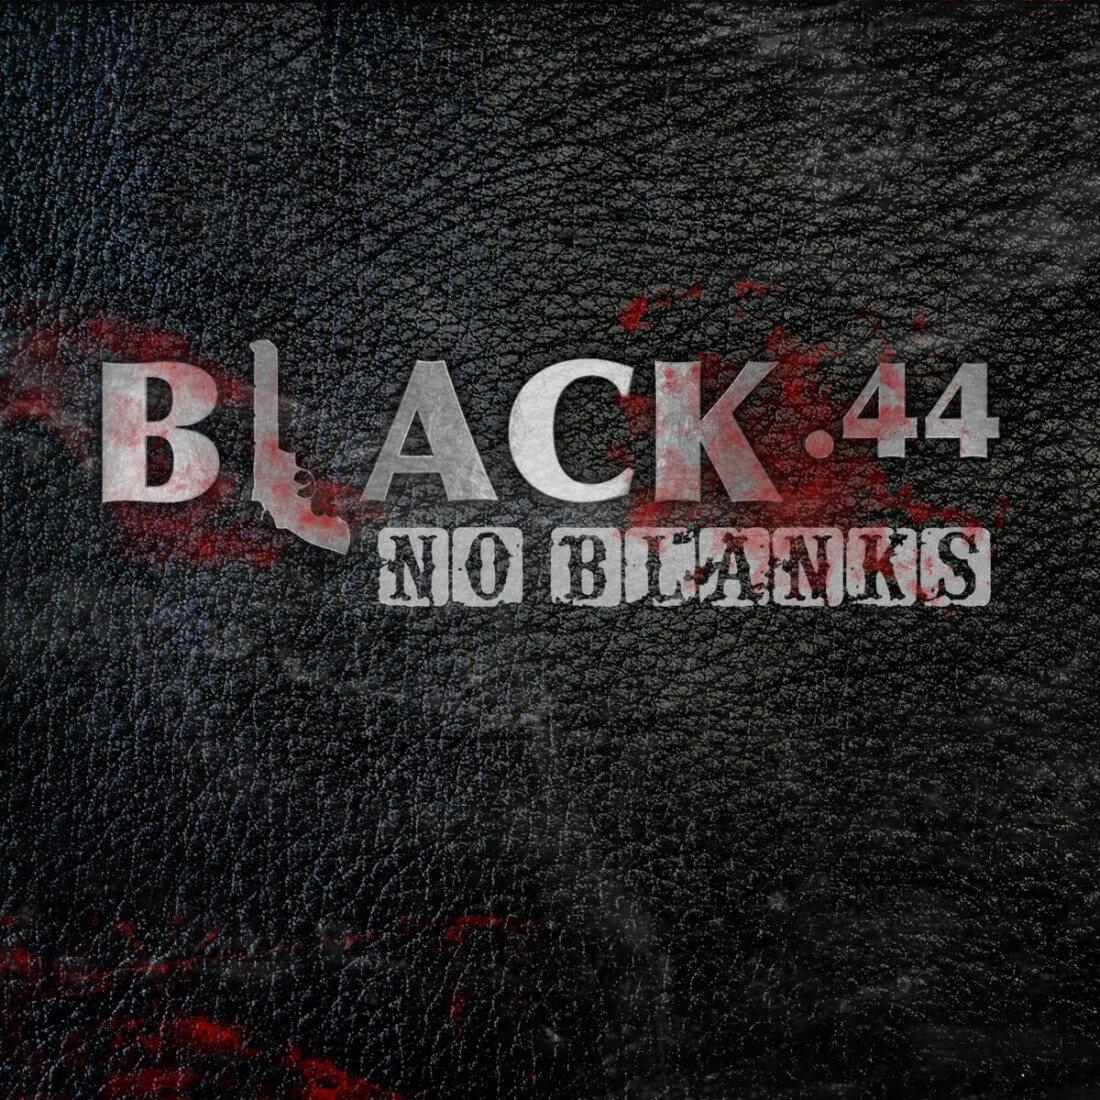 No Blanks